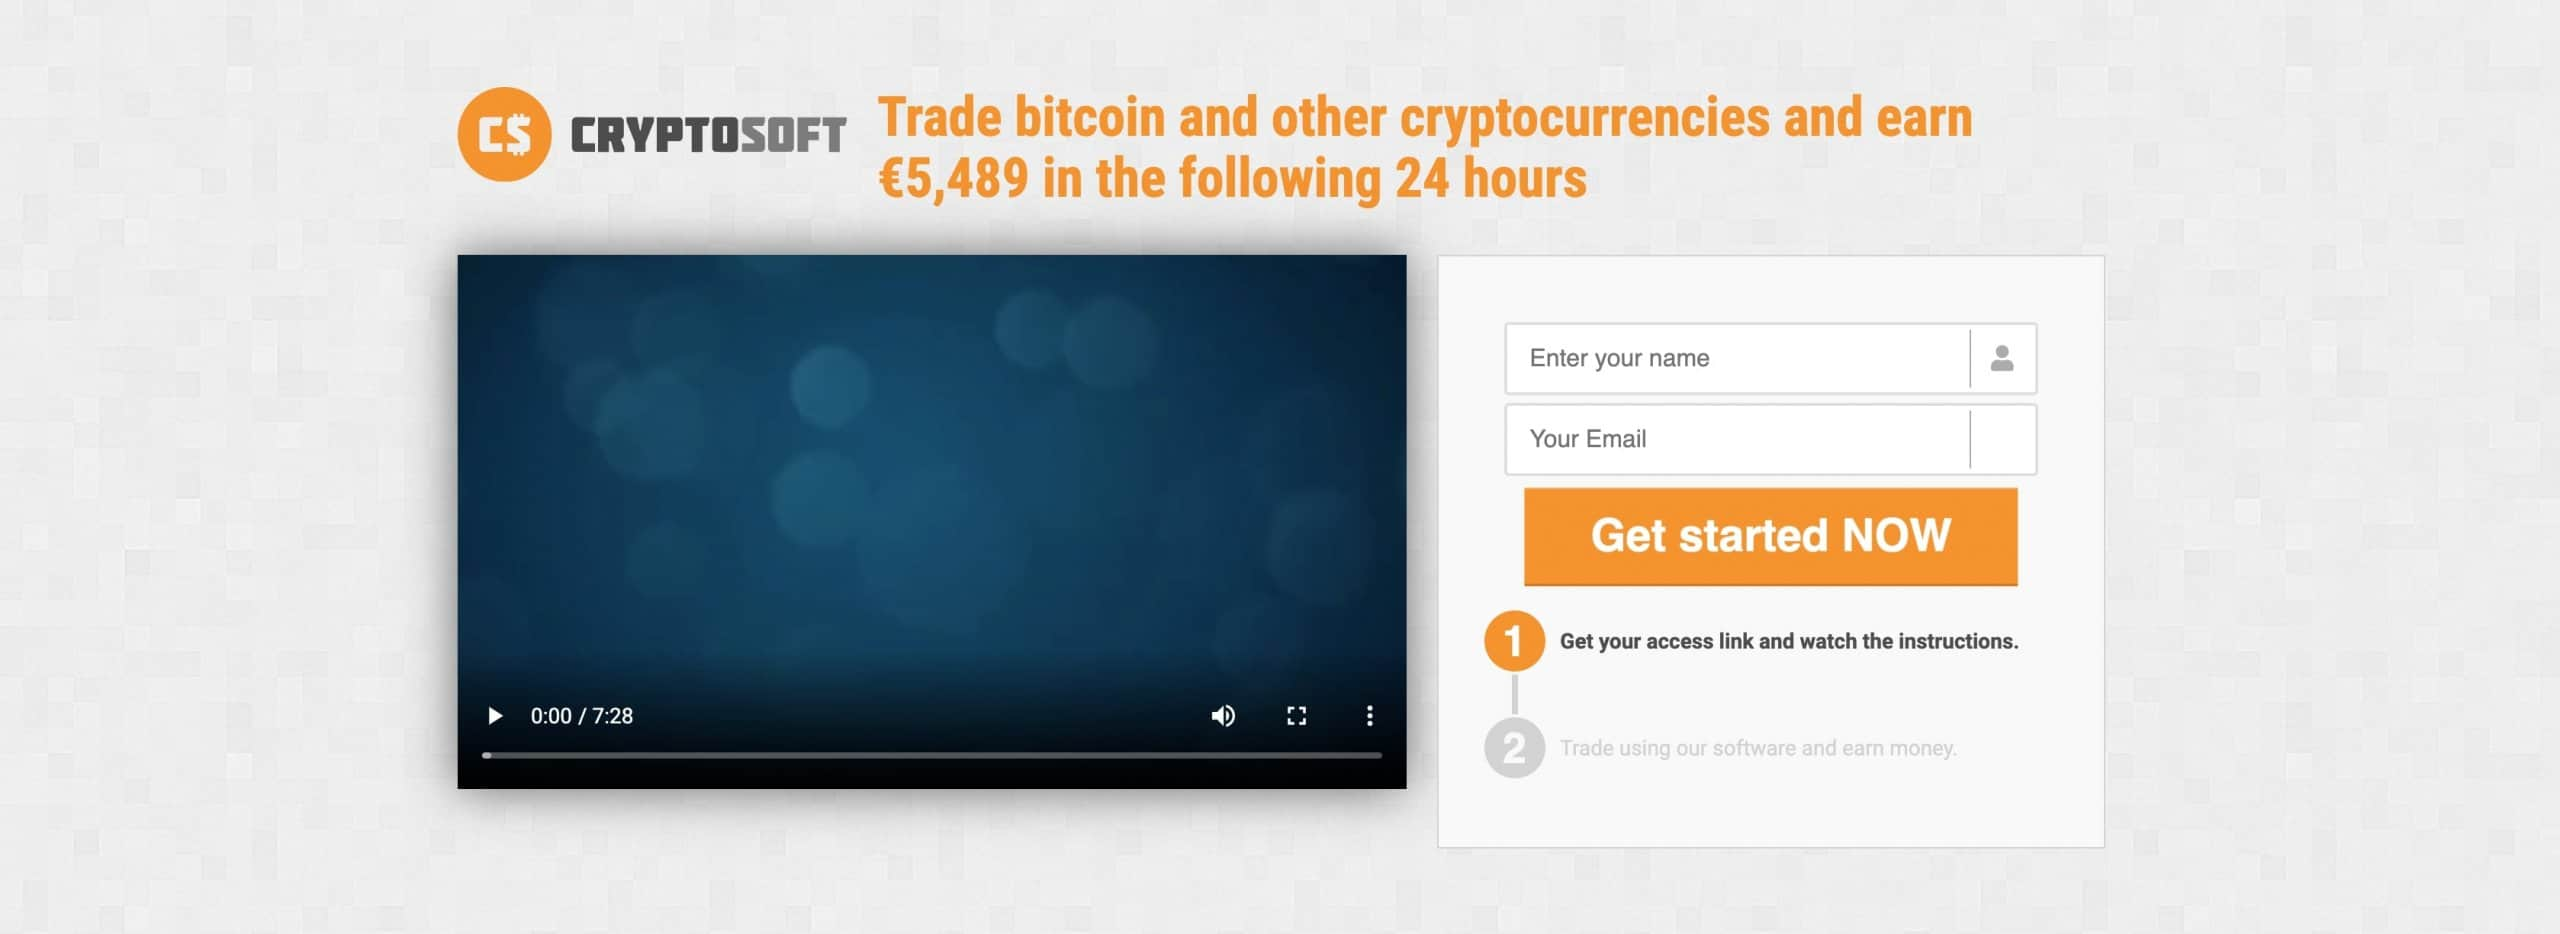 Cryptosoft Anmeldung